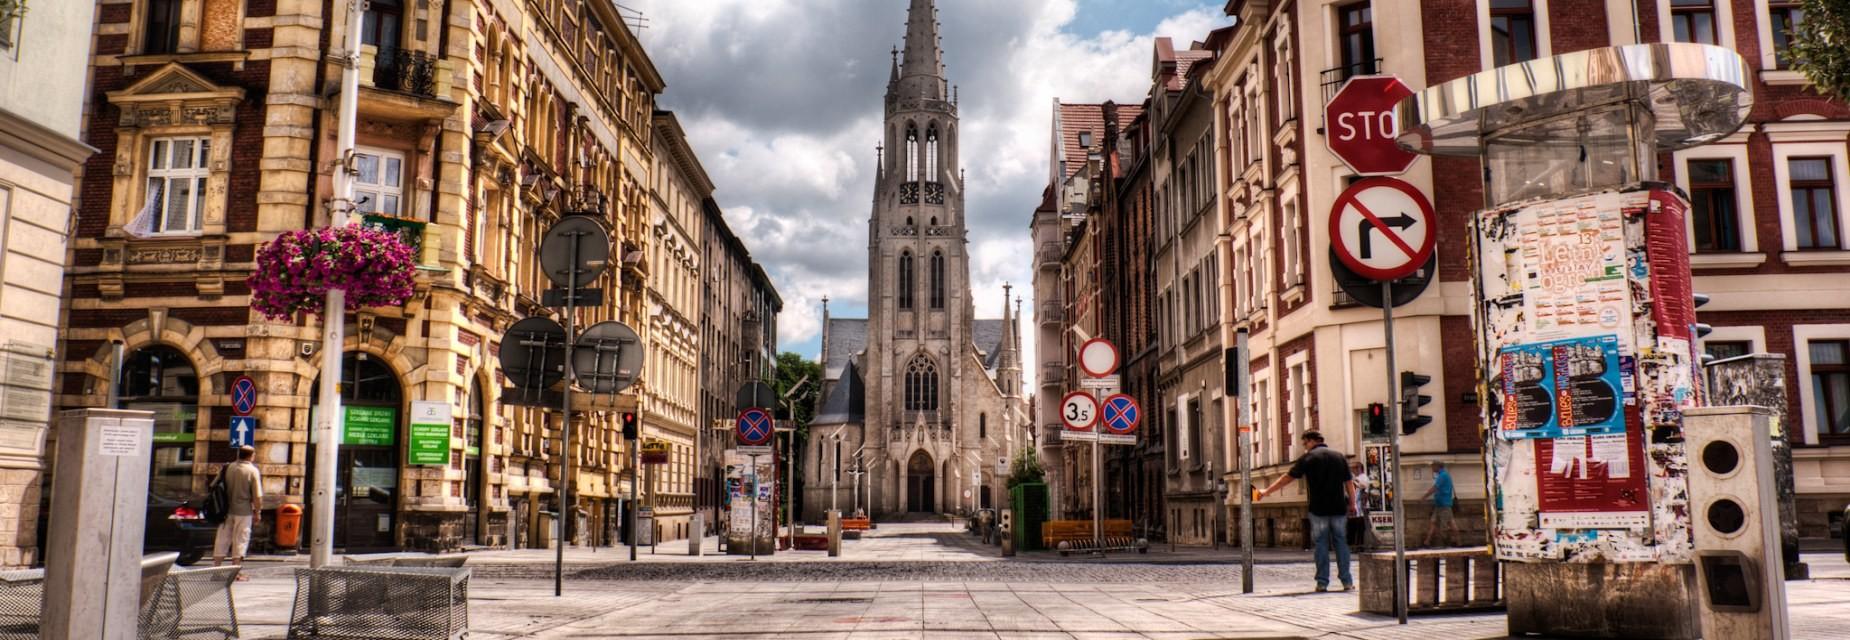 Esperienza a Katowice, Polonia di Ira